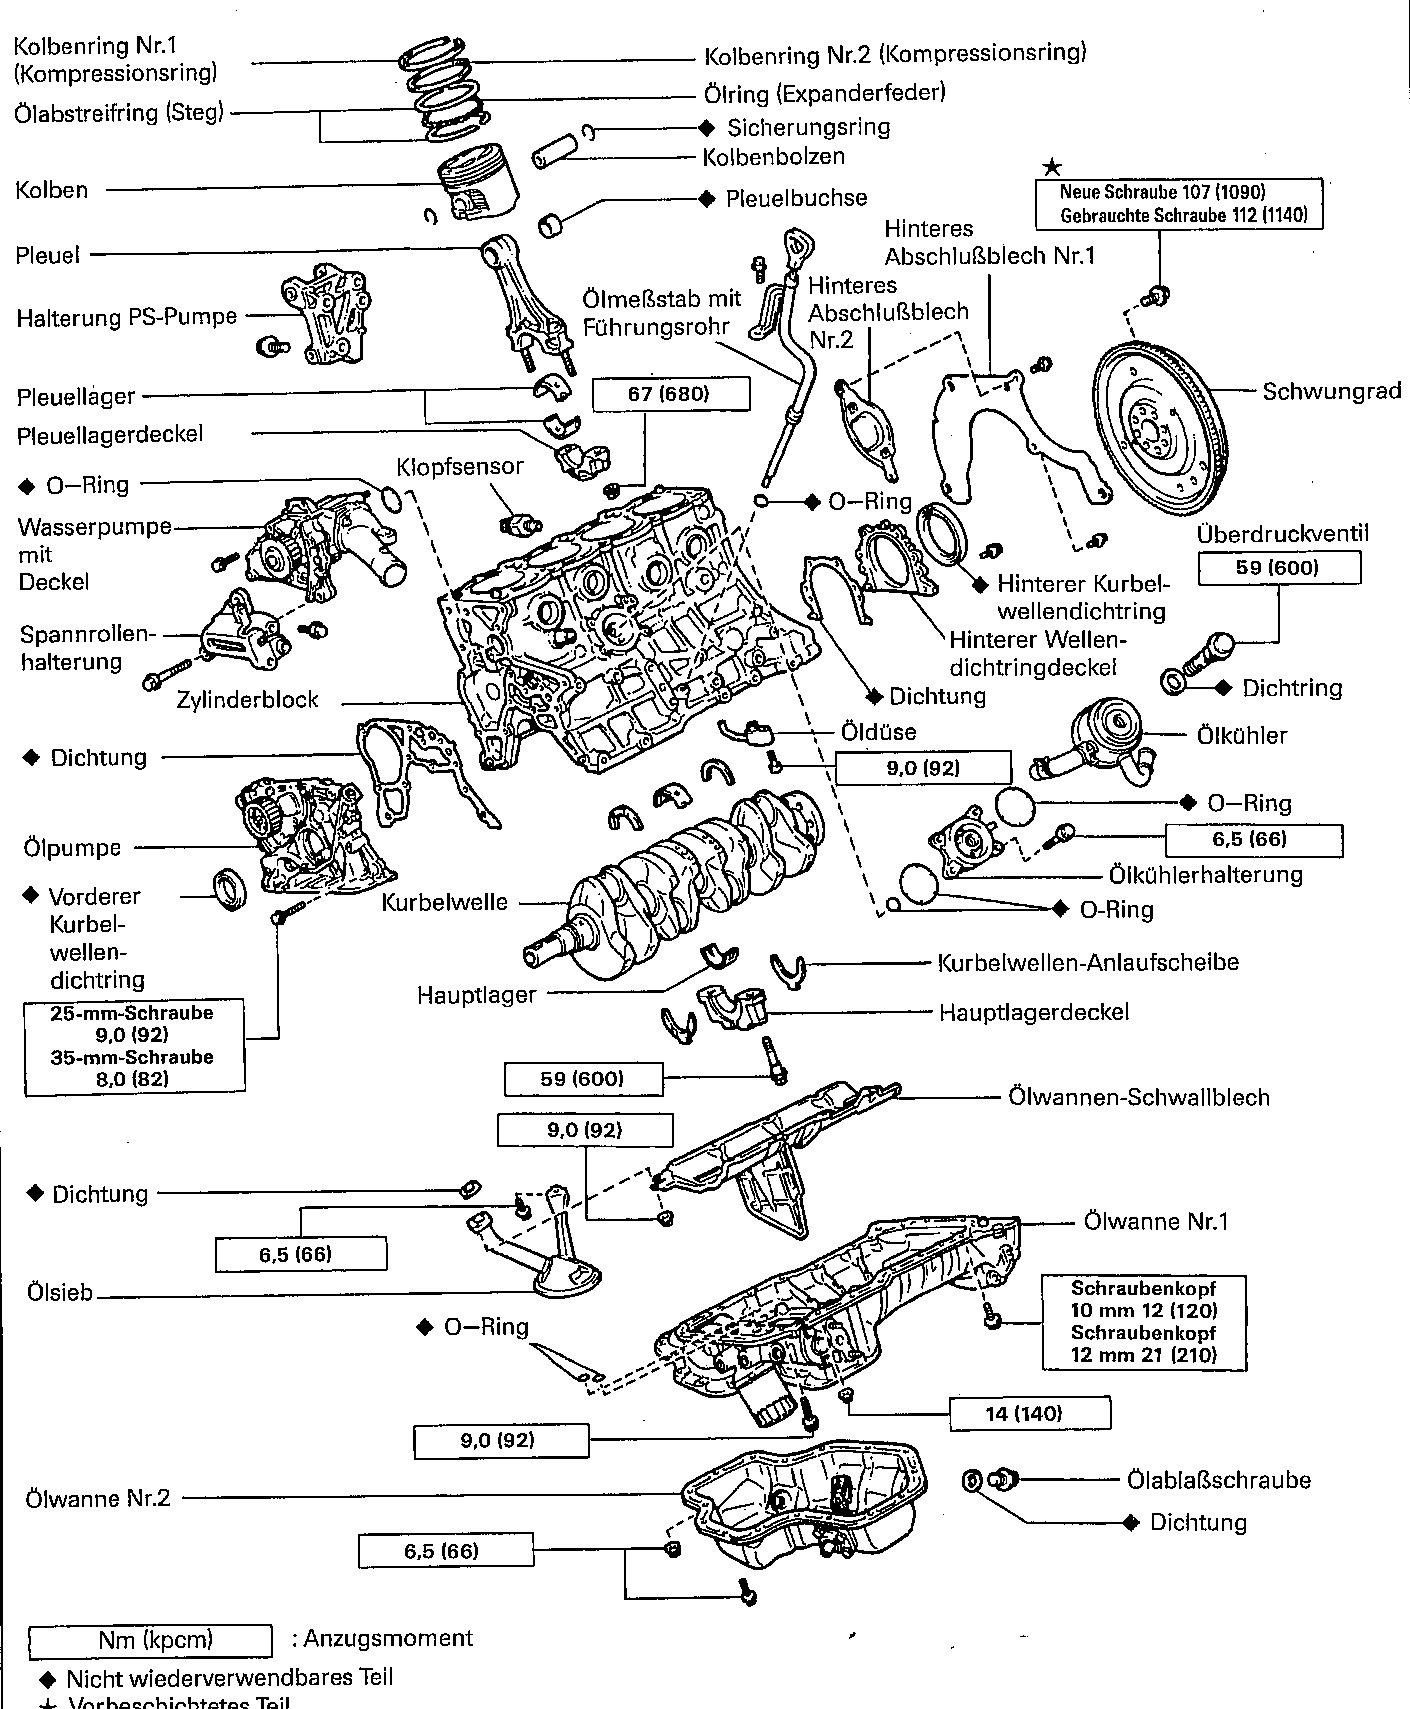 7l5yb Wie Wird Die Kupplung Beim Renault Modus Bj 2005 Diesel En in addition Wiring Diagram 1960 Austin Healey furthermore Roll Cage Steel Chrome Molly together with P 0996b43f8025edaf moreover Crower Cam Set Toyota 1zz Fe Stage 3. on toyota mr2